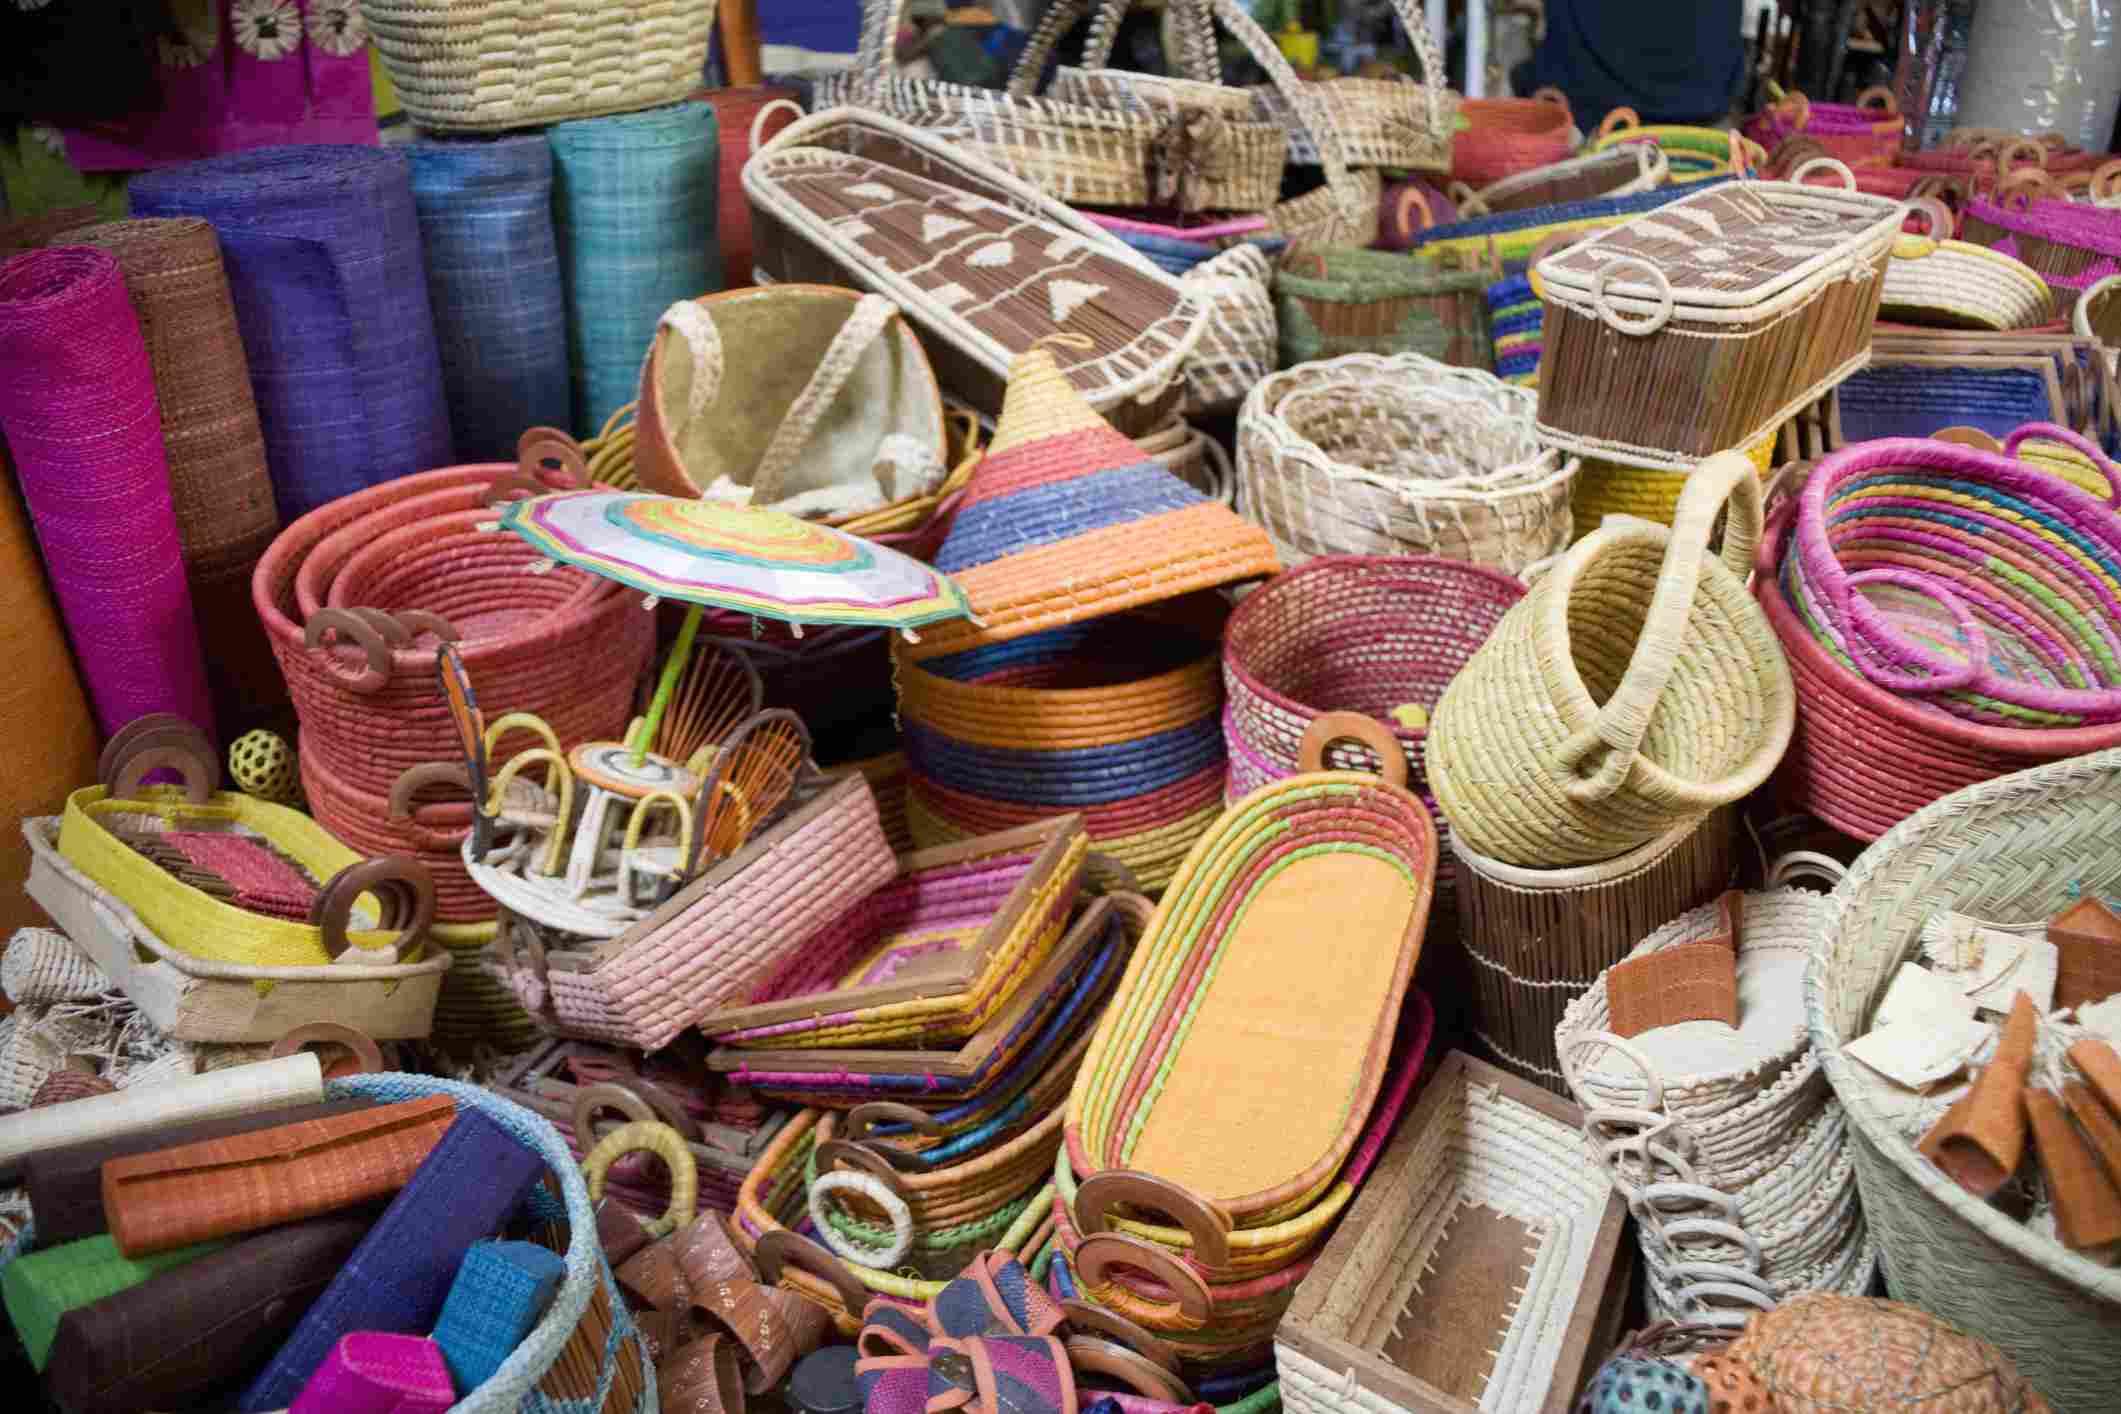 Raffia baskets at a market in Antananarivo